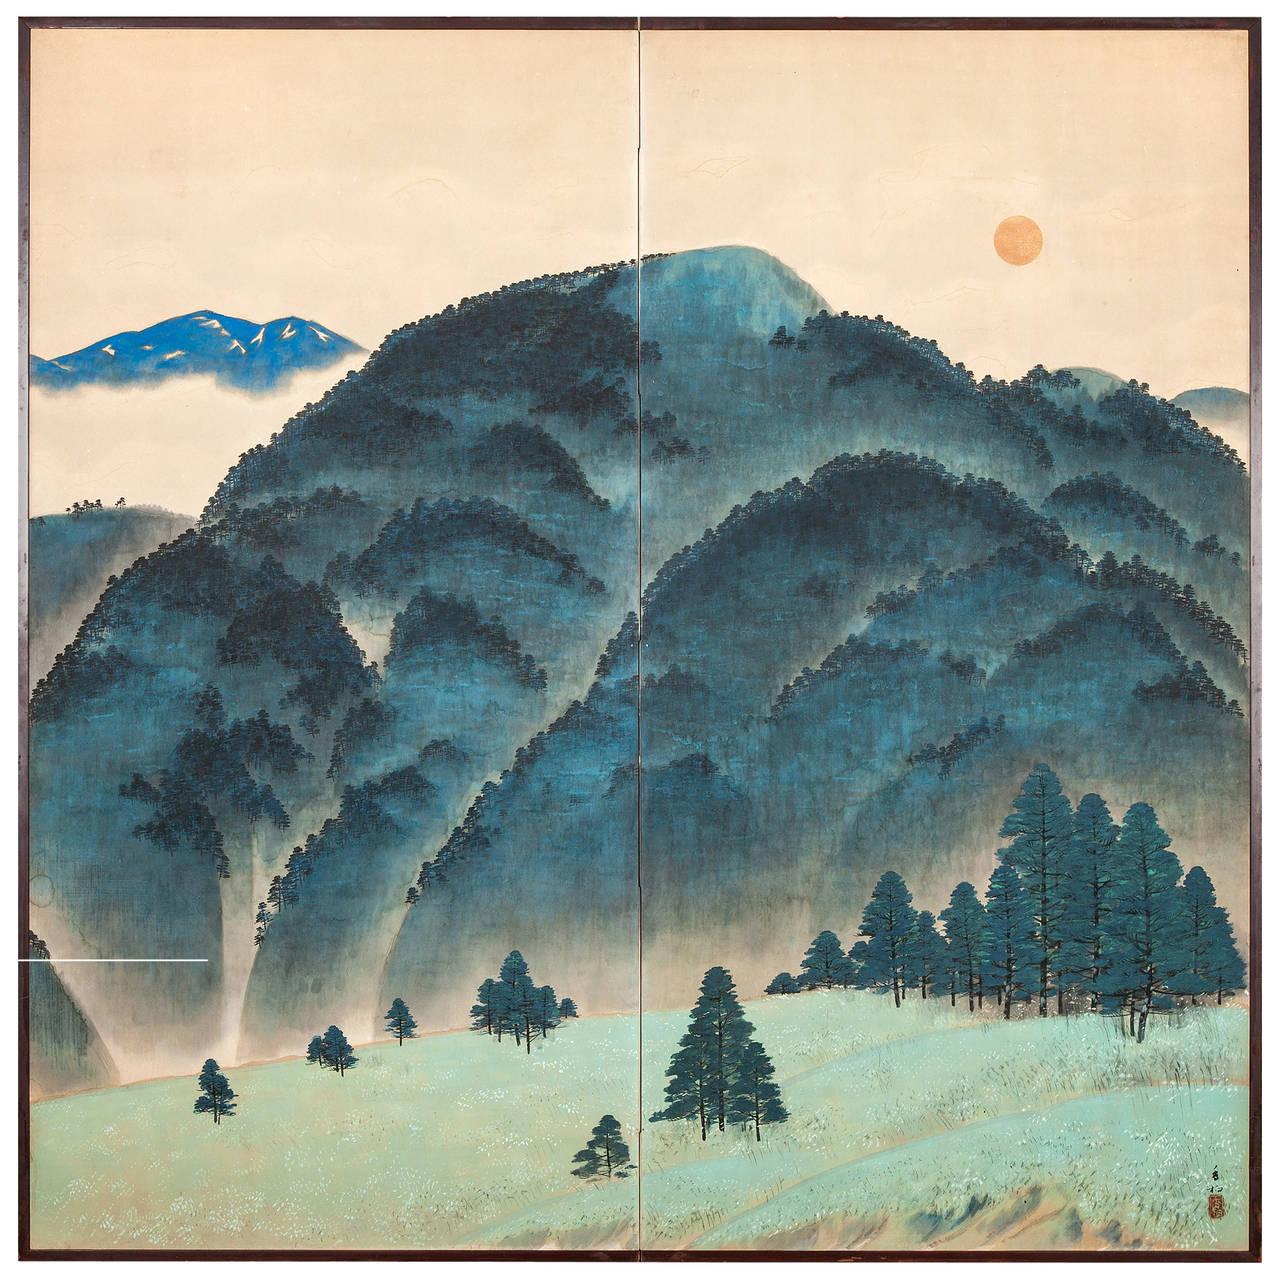 1280x1280 Japanese Screen Blue Mountain Landscape